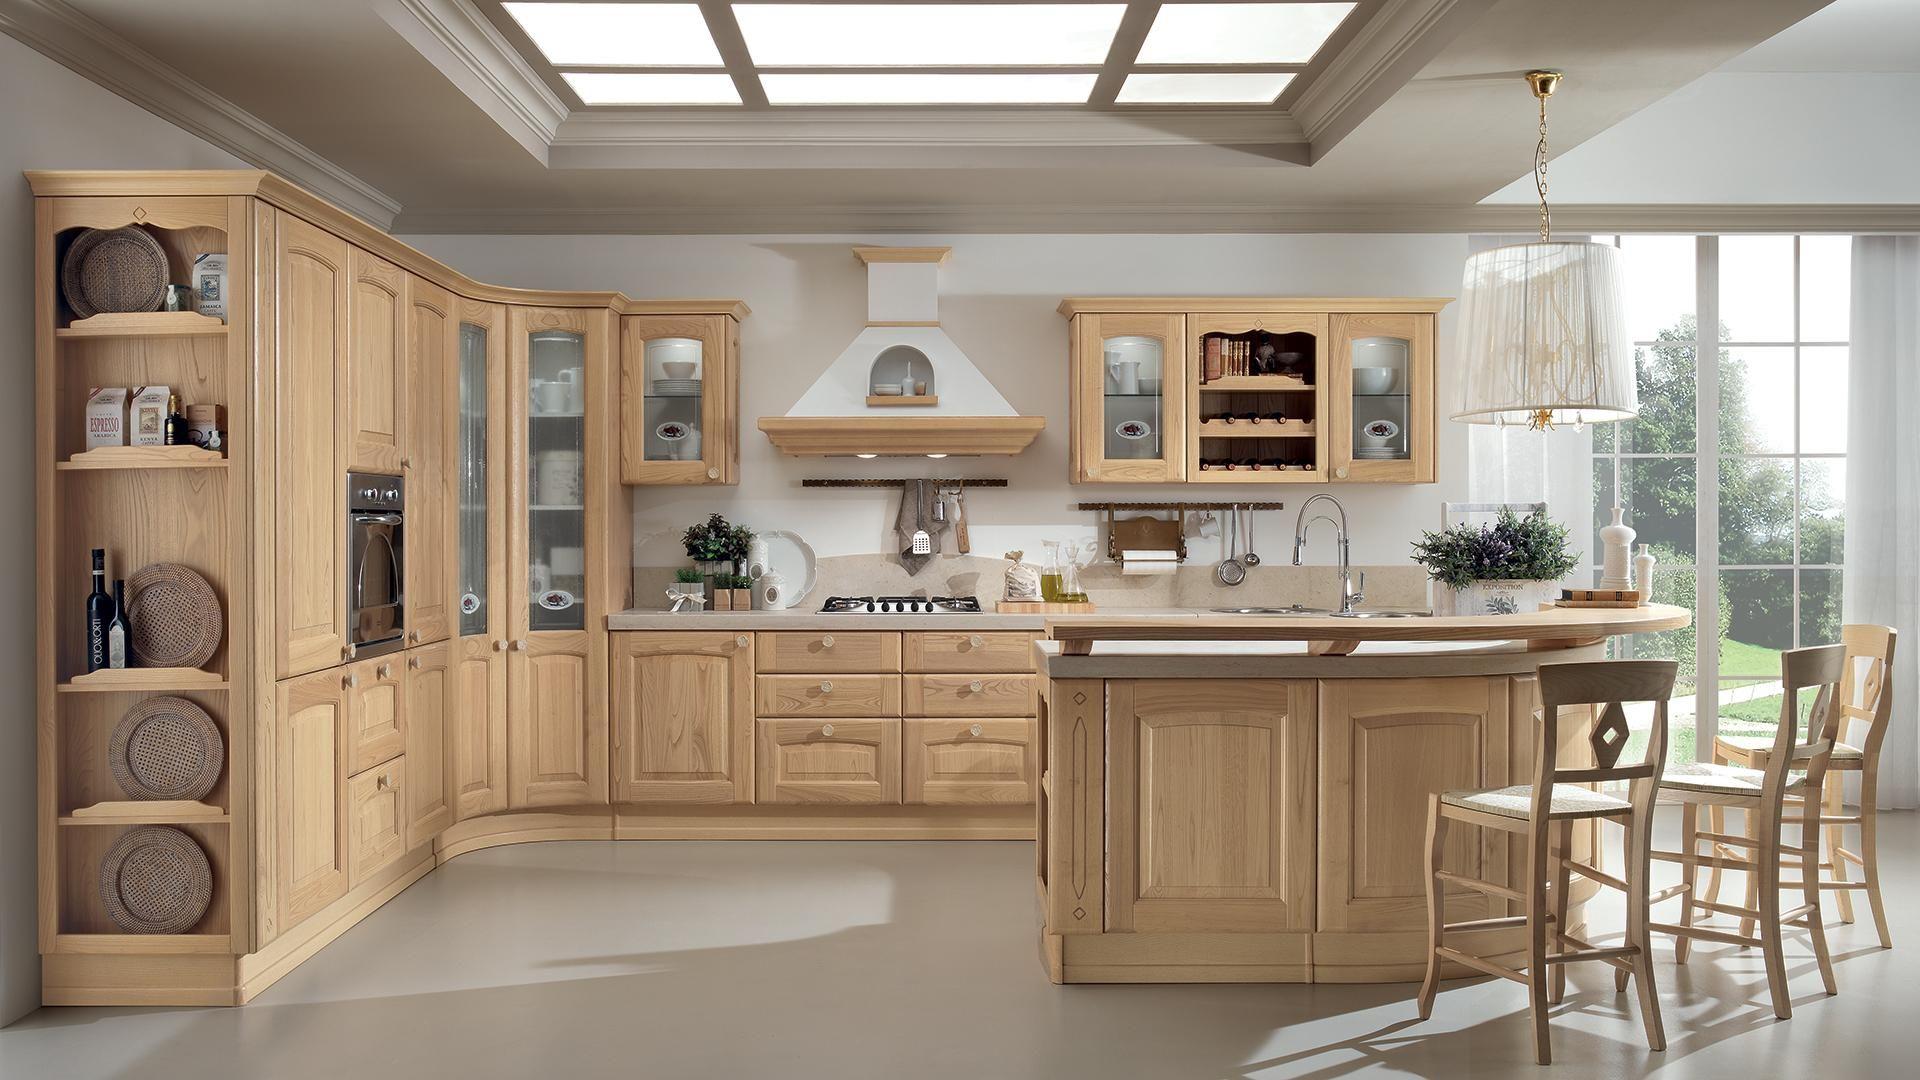 Veronica - Cucine Classiche - Cucine Lube   cucina lube Veronica ...